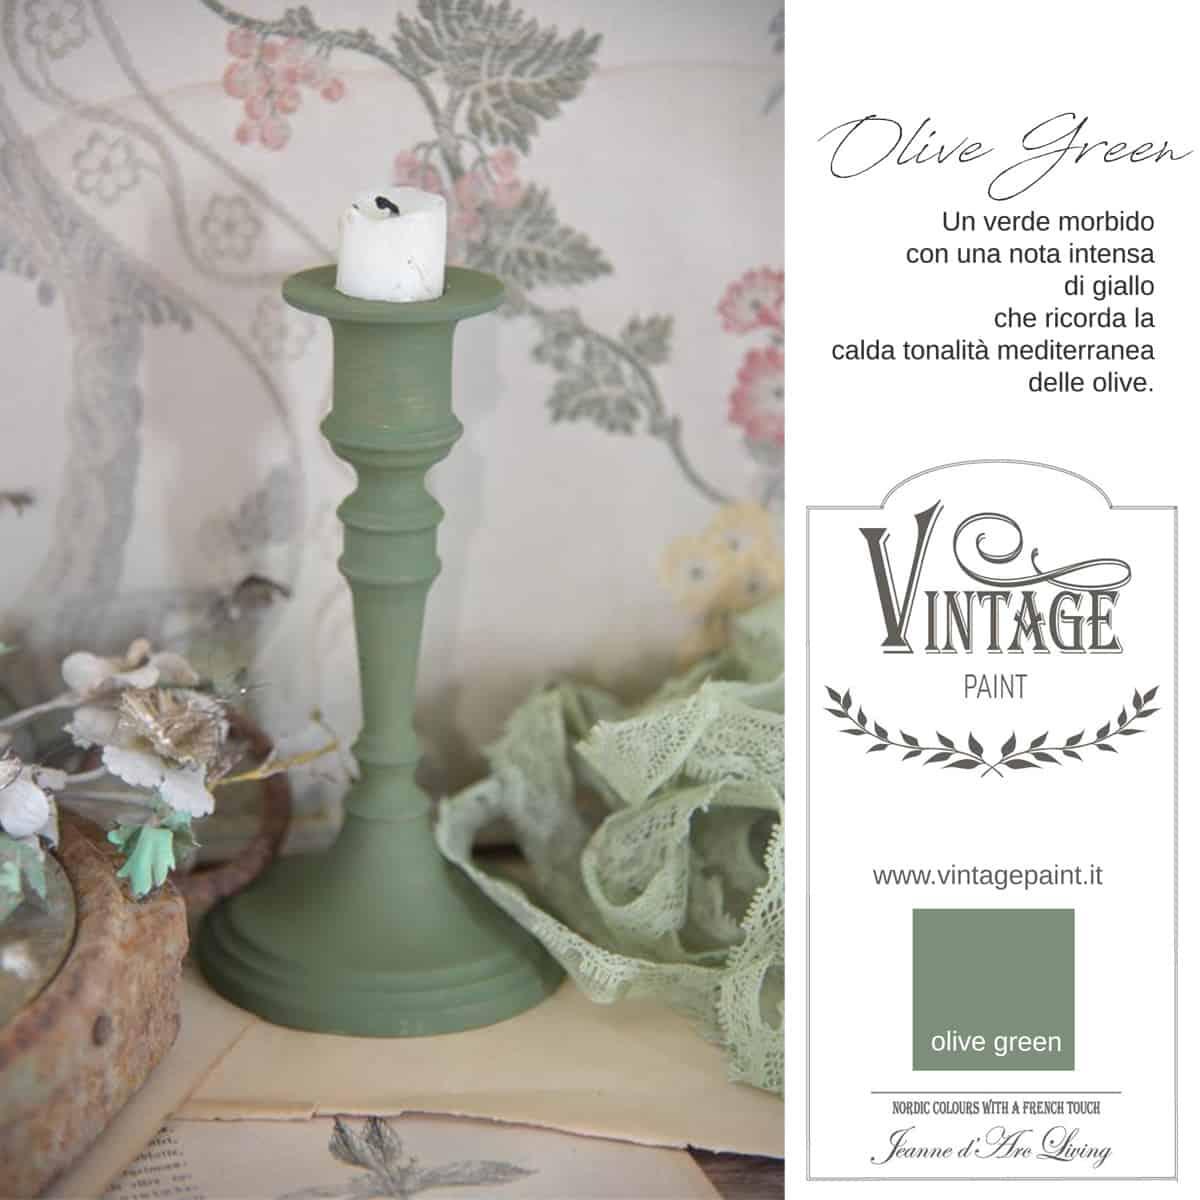 olive green verde vintage chalk paint vernici shabby chic autentico look gesso